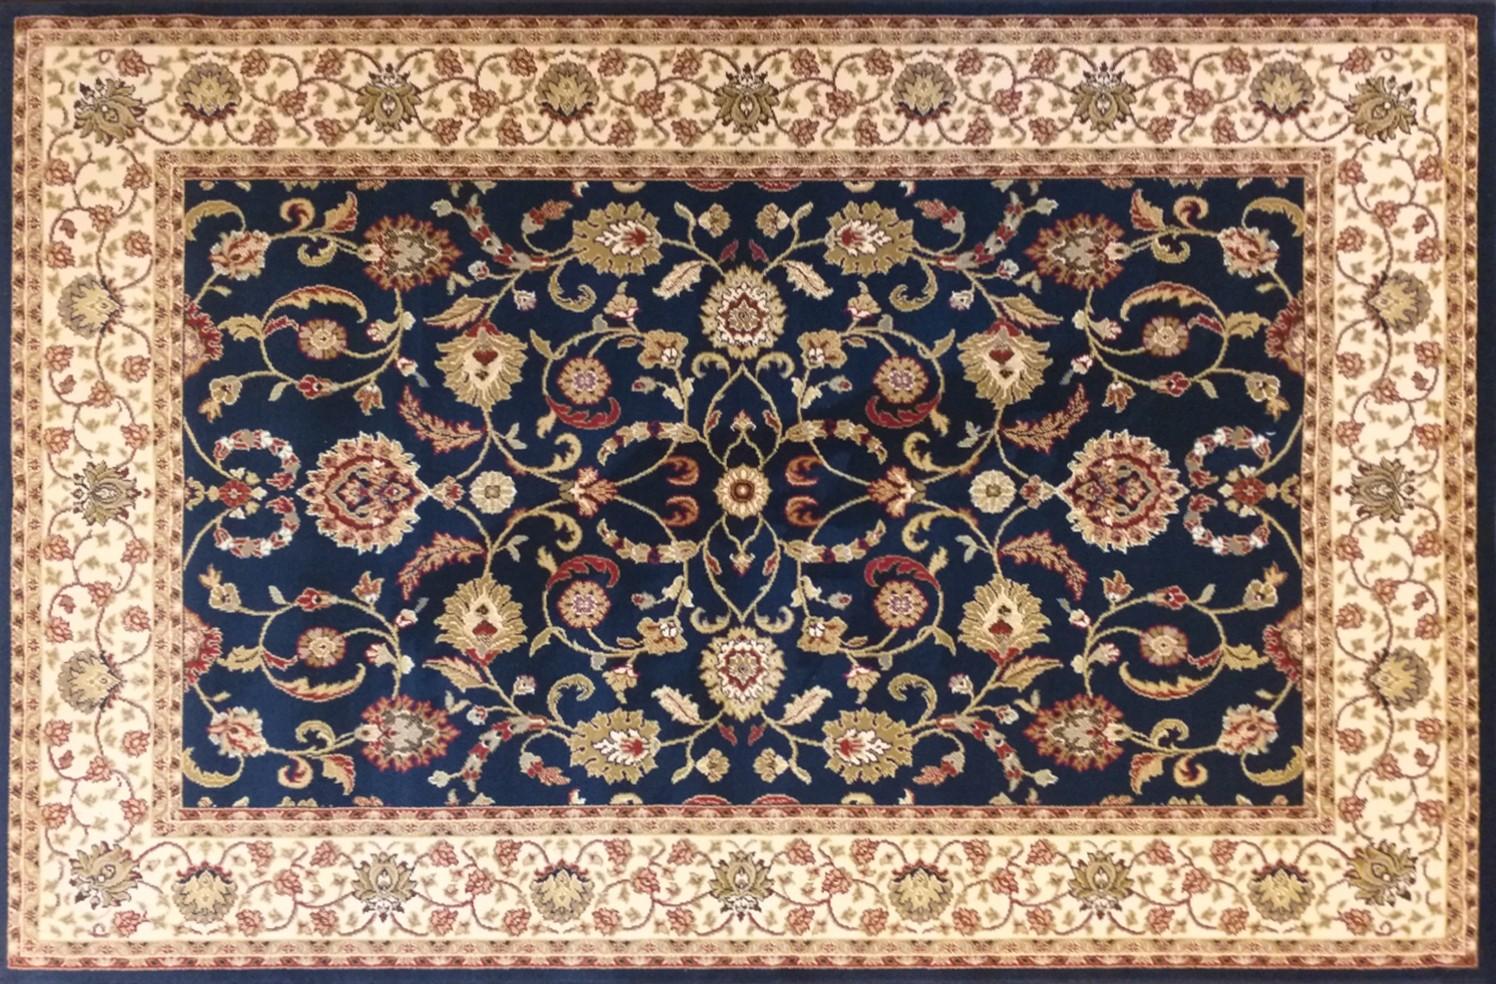 TAPETE EGÍPCIO TASHKENT - 2.35m x 1.60m